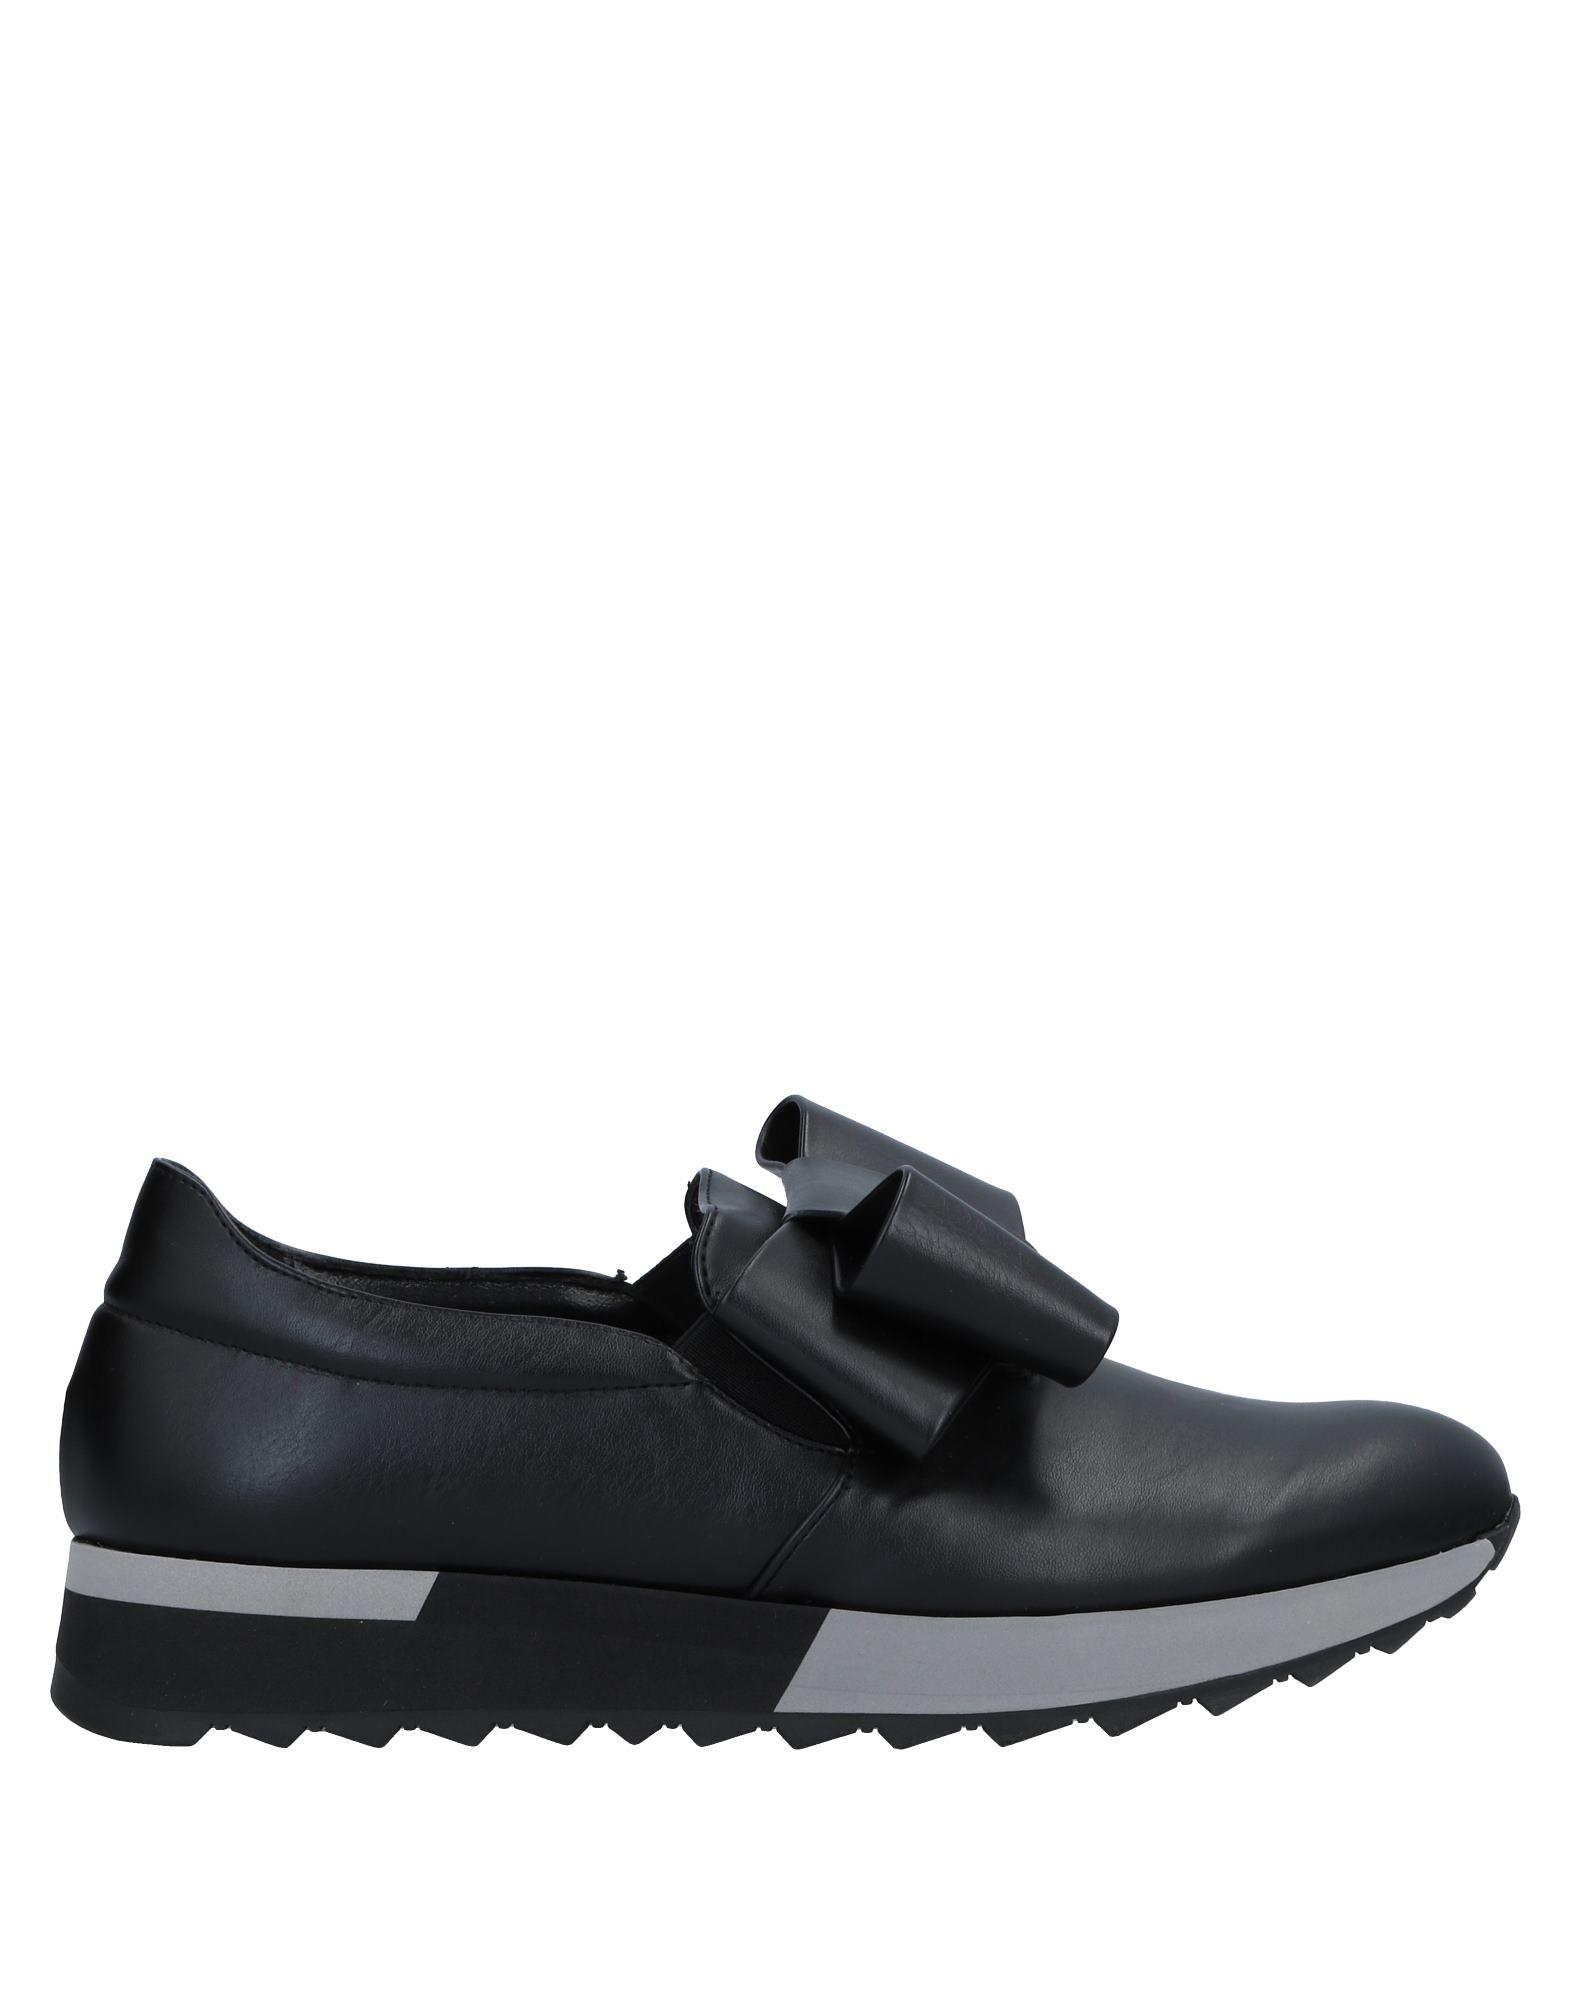 Angela George Sneakers Damen  11533970KK Gute Qualität beliebte Schuhe